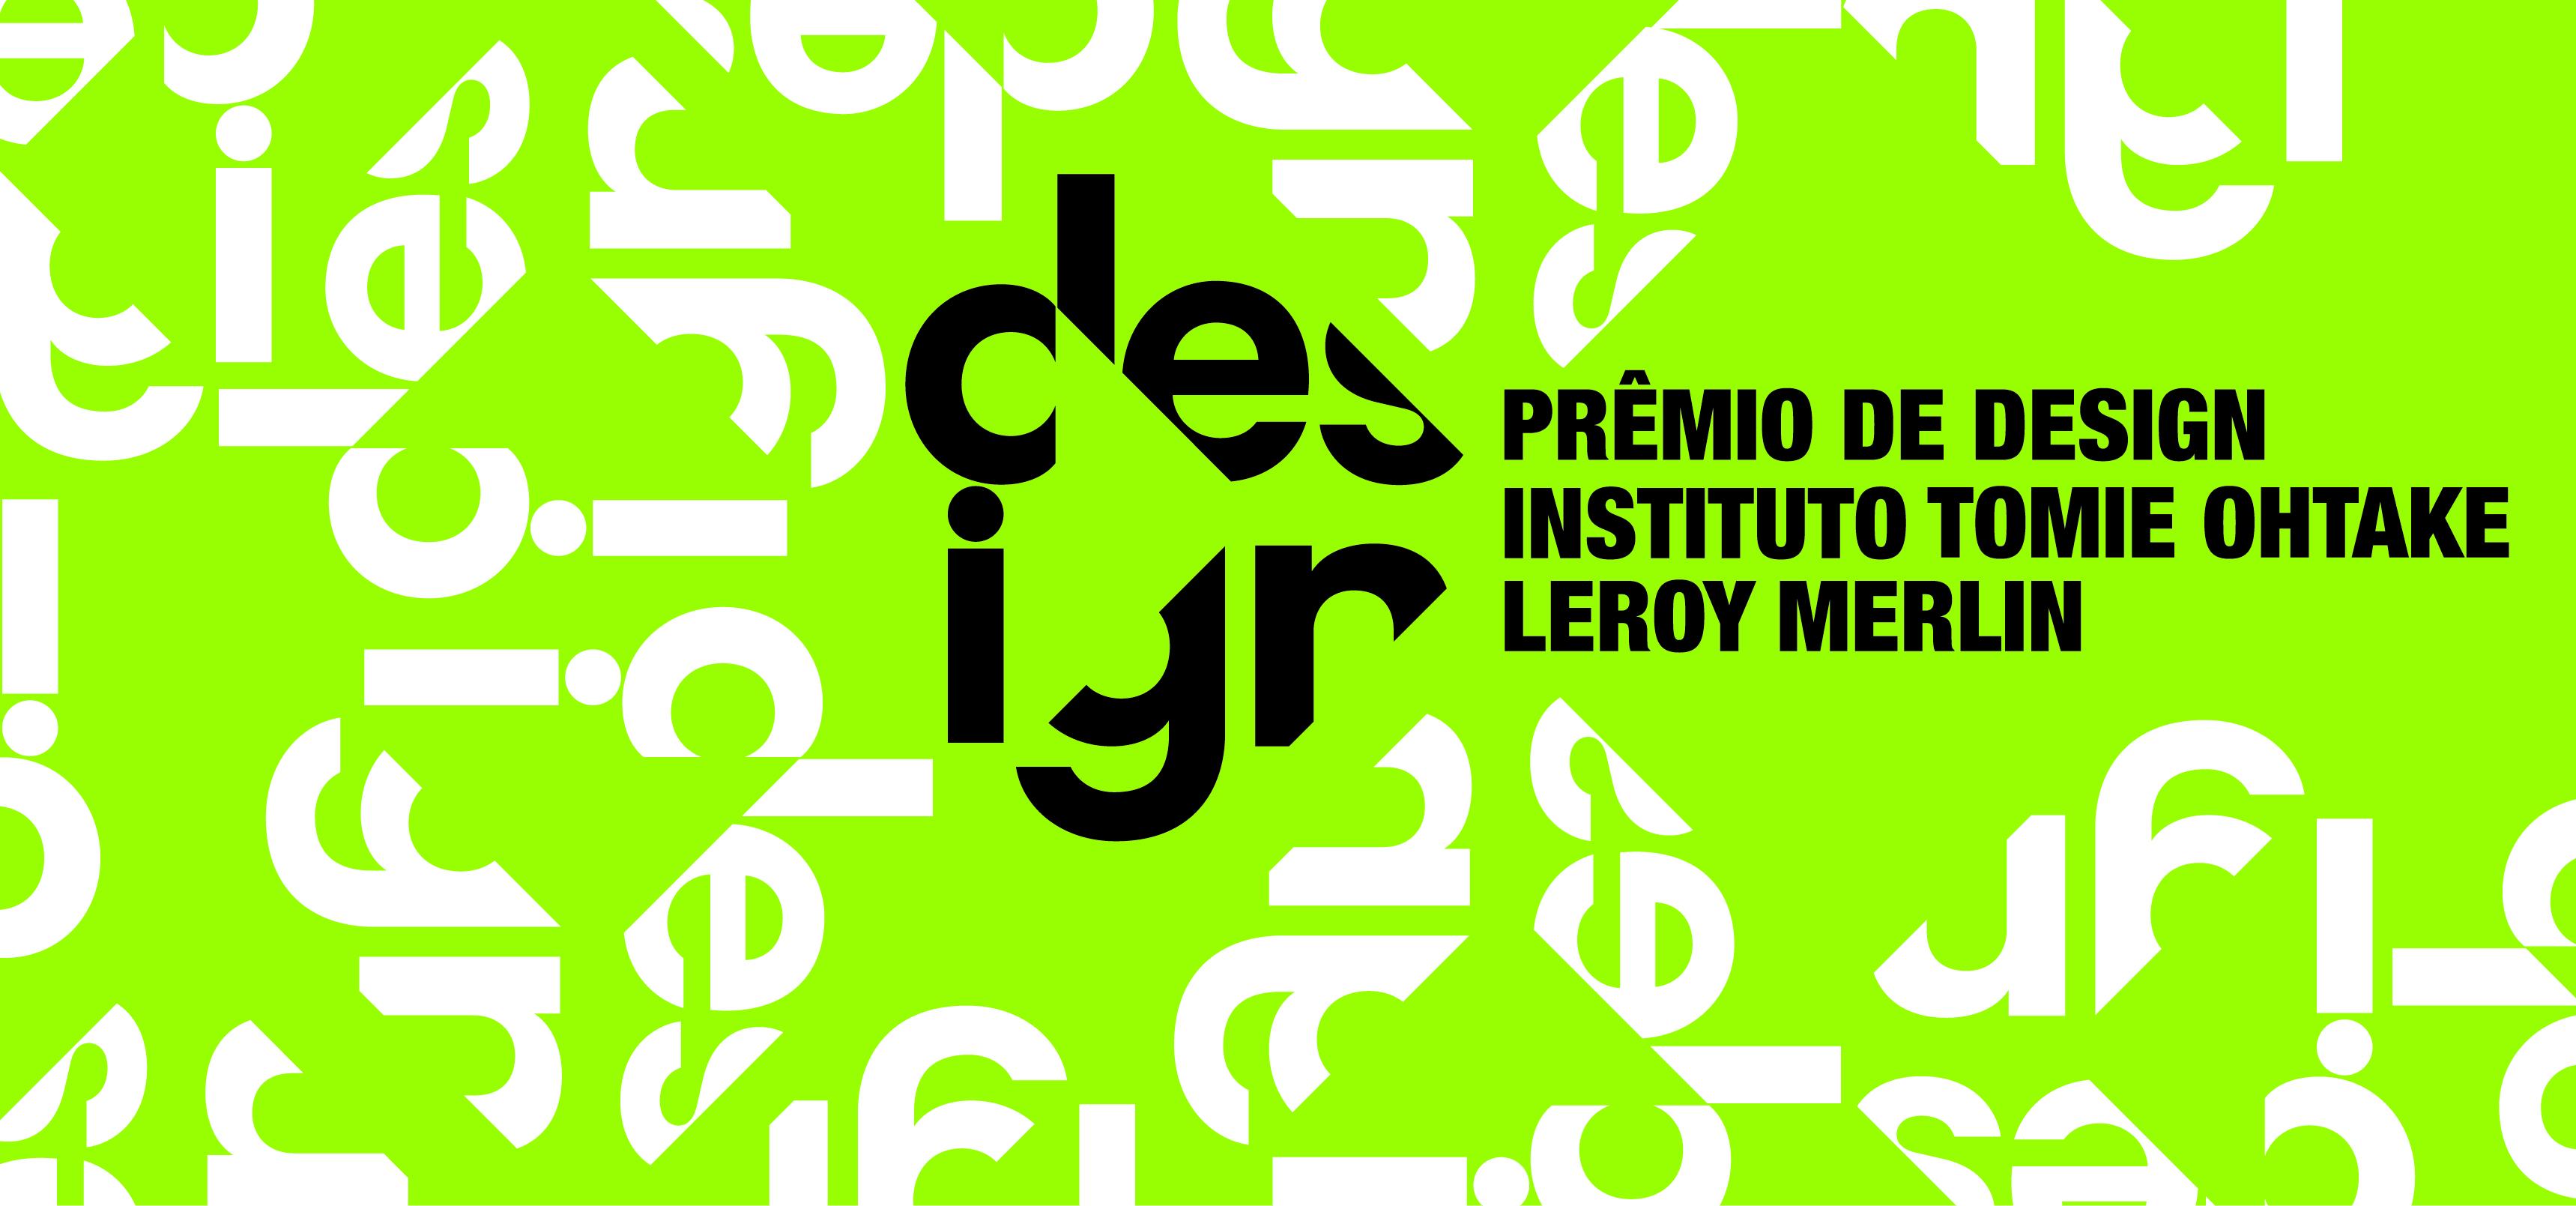 Instituto Tomie Ohtake Leroy Merlin Design Award